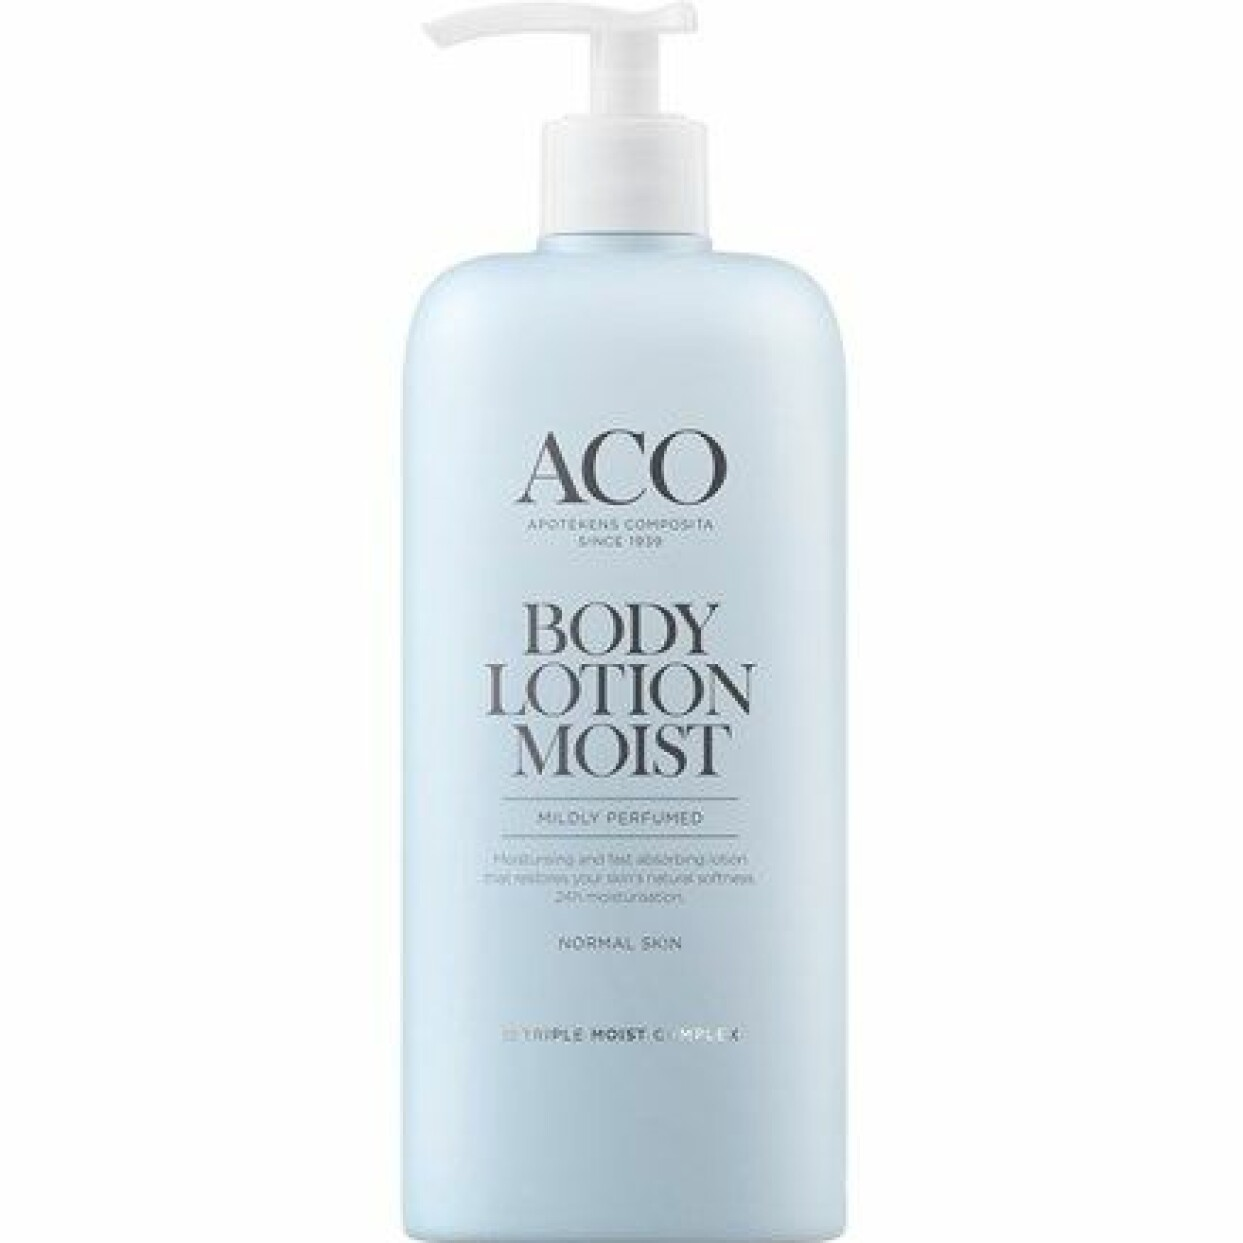 Body lotion moist från ACO